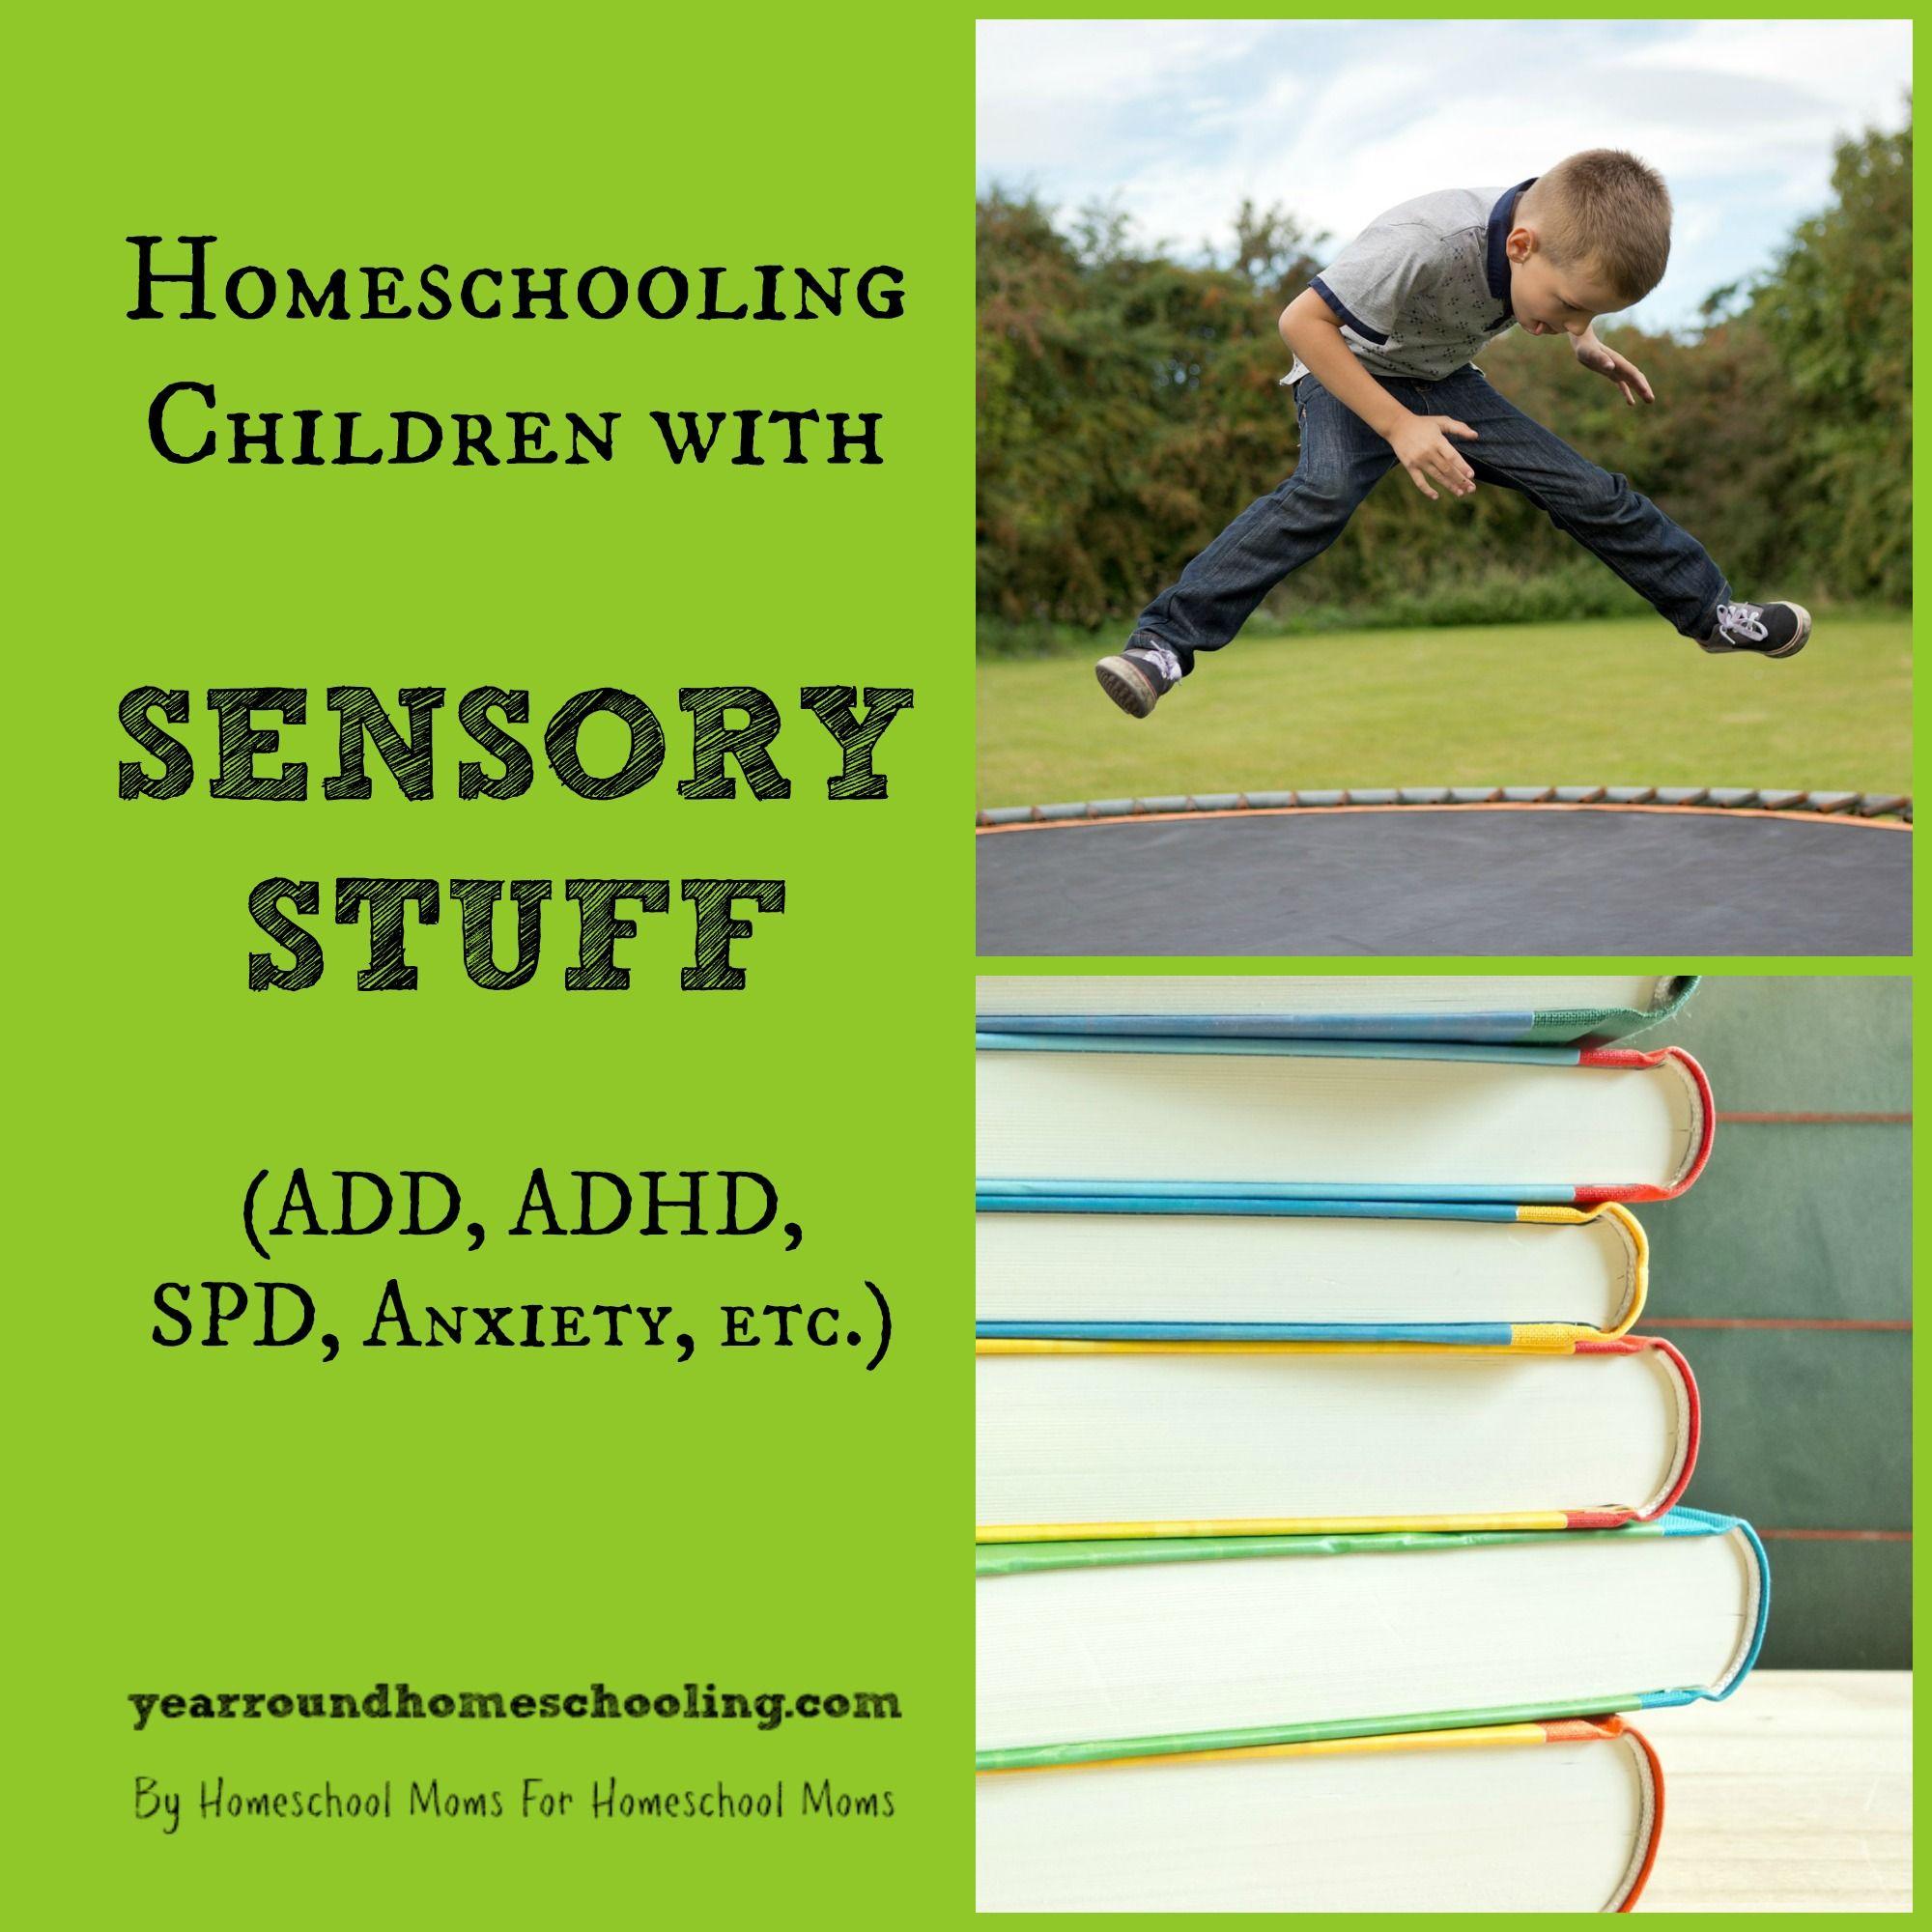 Homeschooling Children With Sensory Stuff